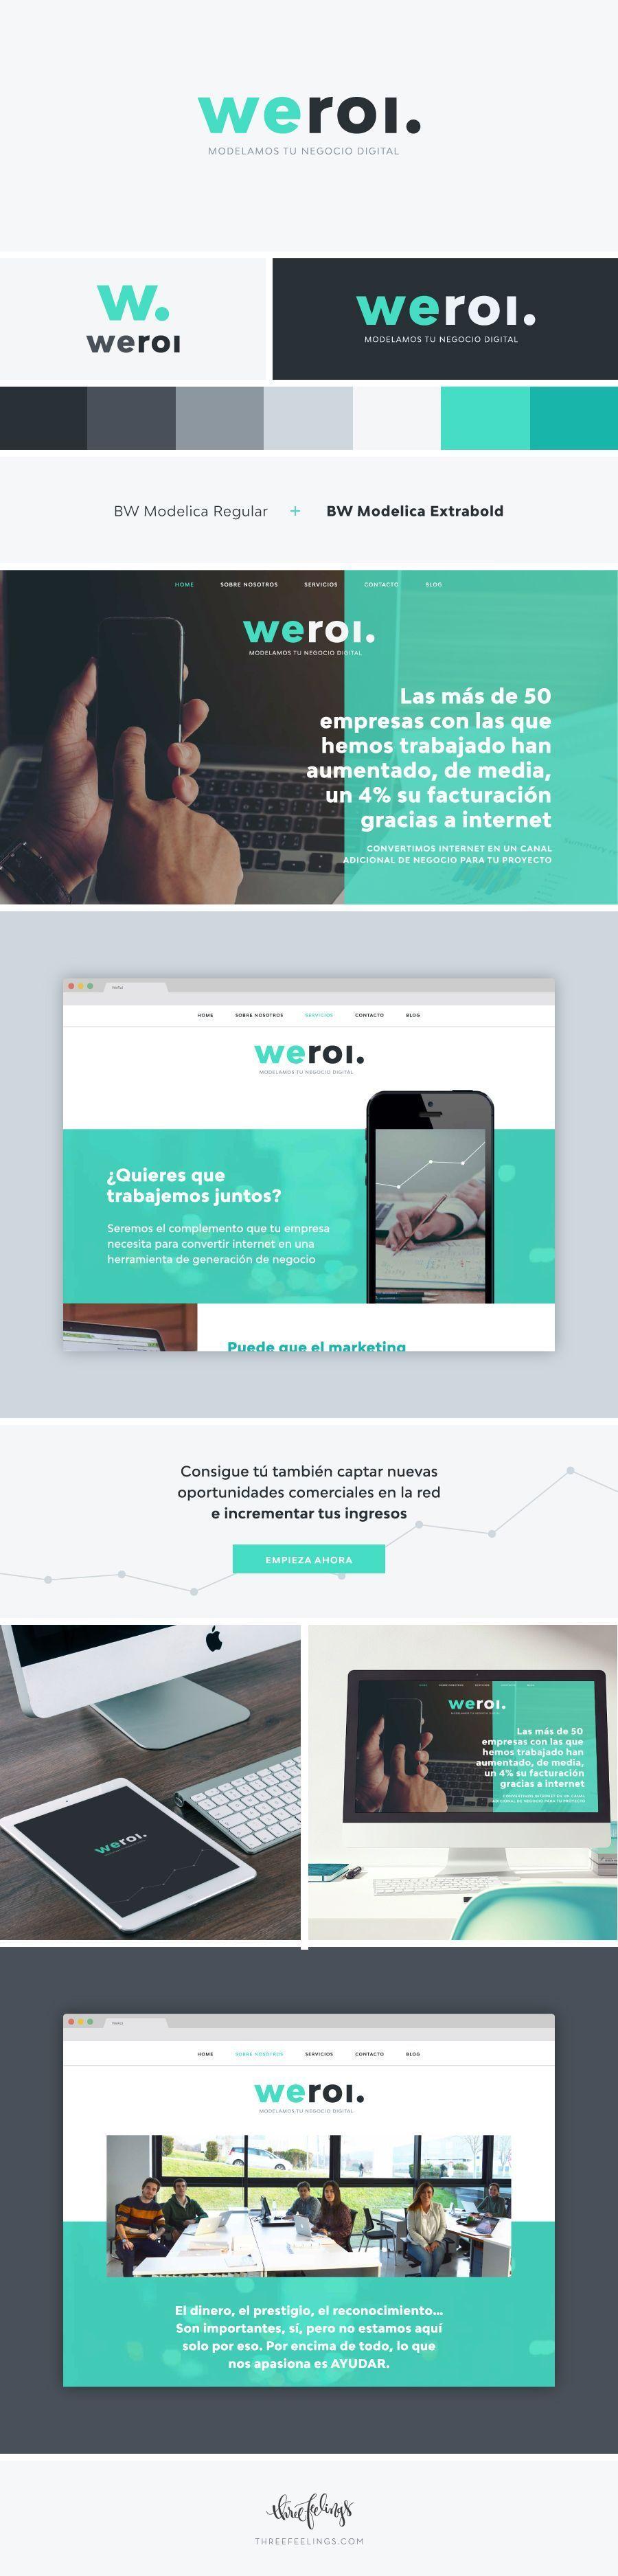 portfolio-diseno-identidad-paginaweb-personalizada-weroi-threefeelings-03